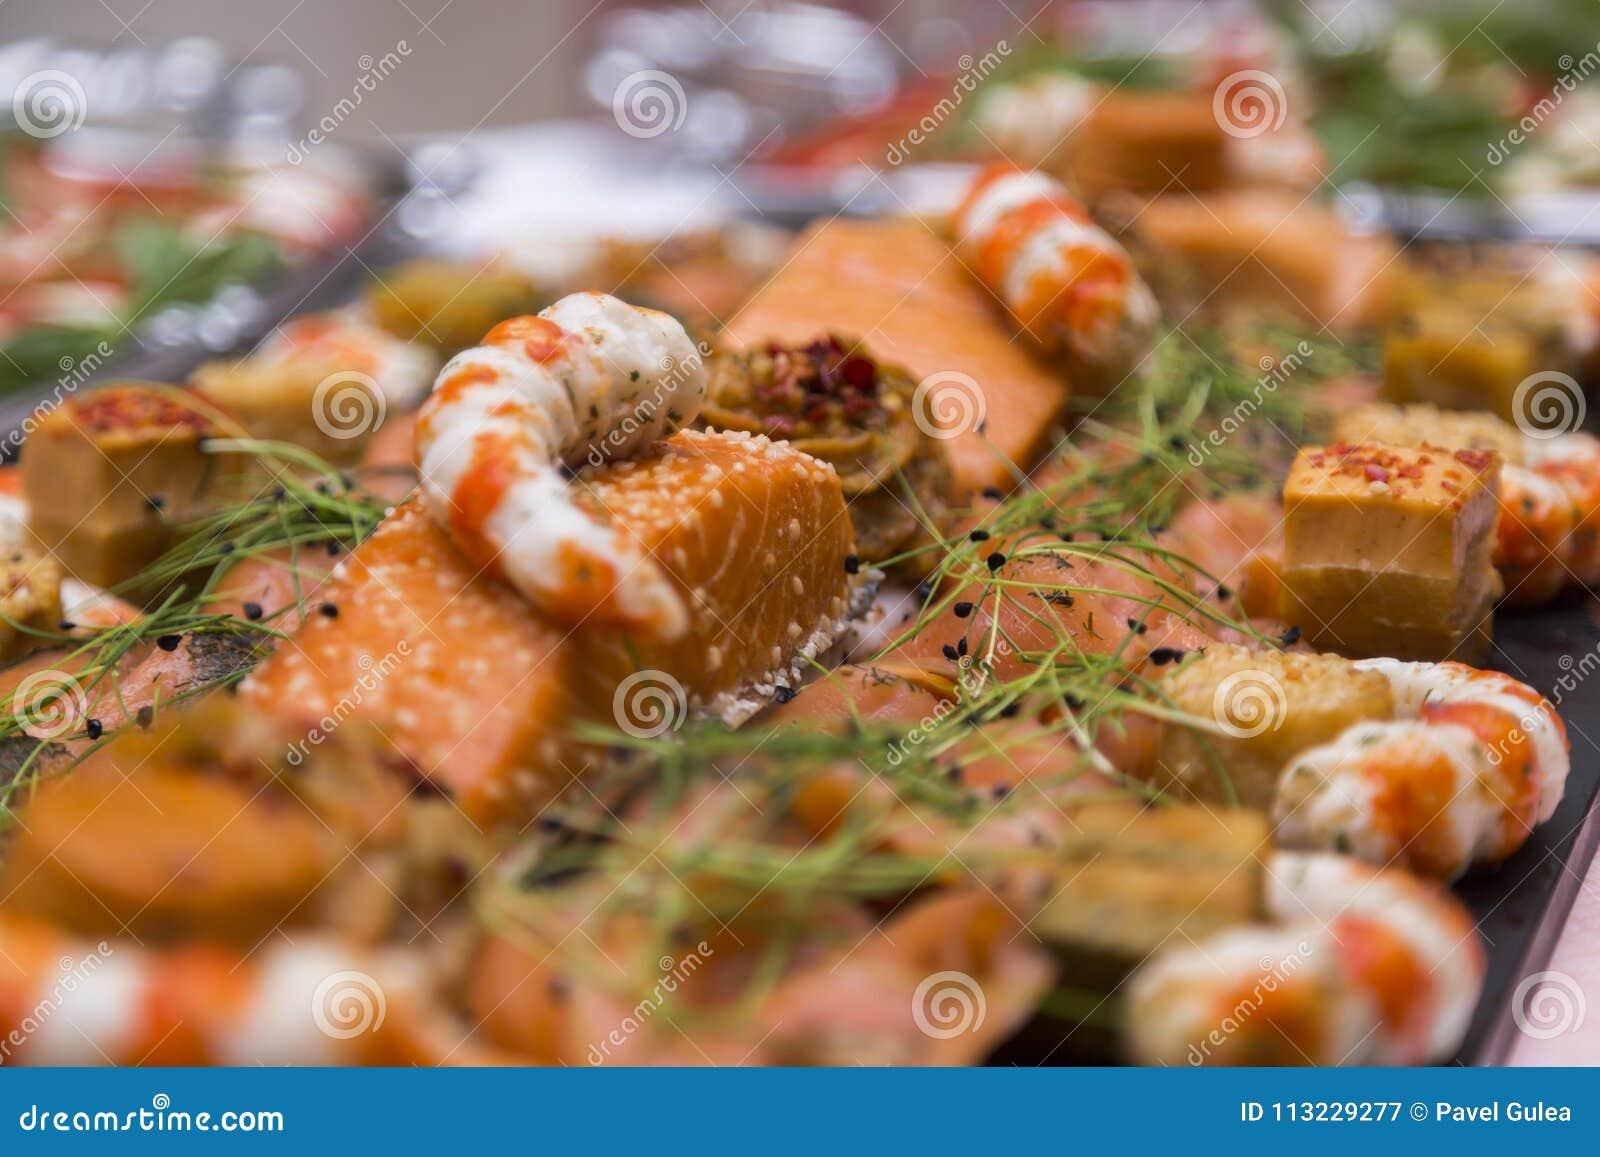 Wedding buffet with Cuisine Culinary Buffet Food